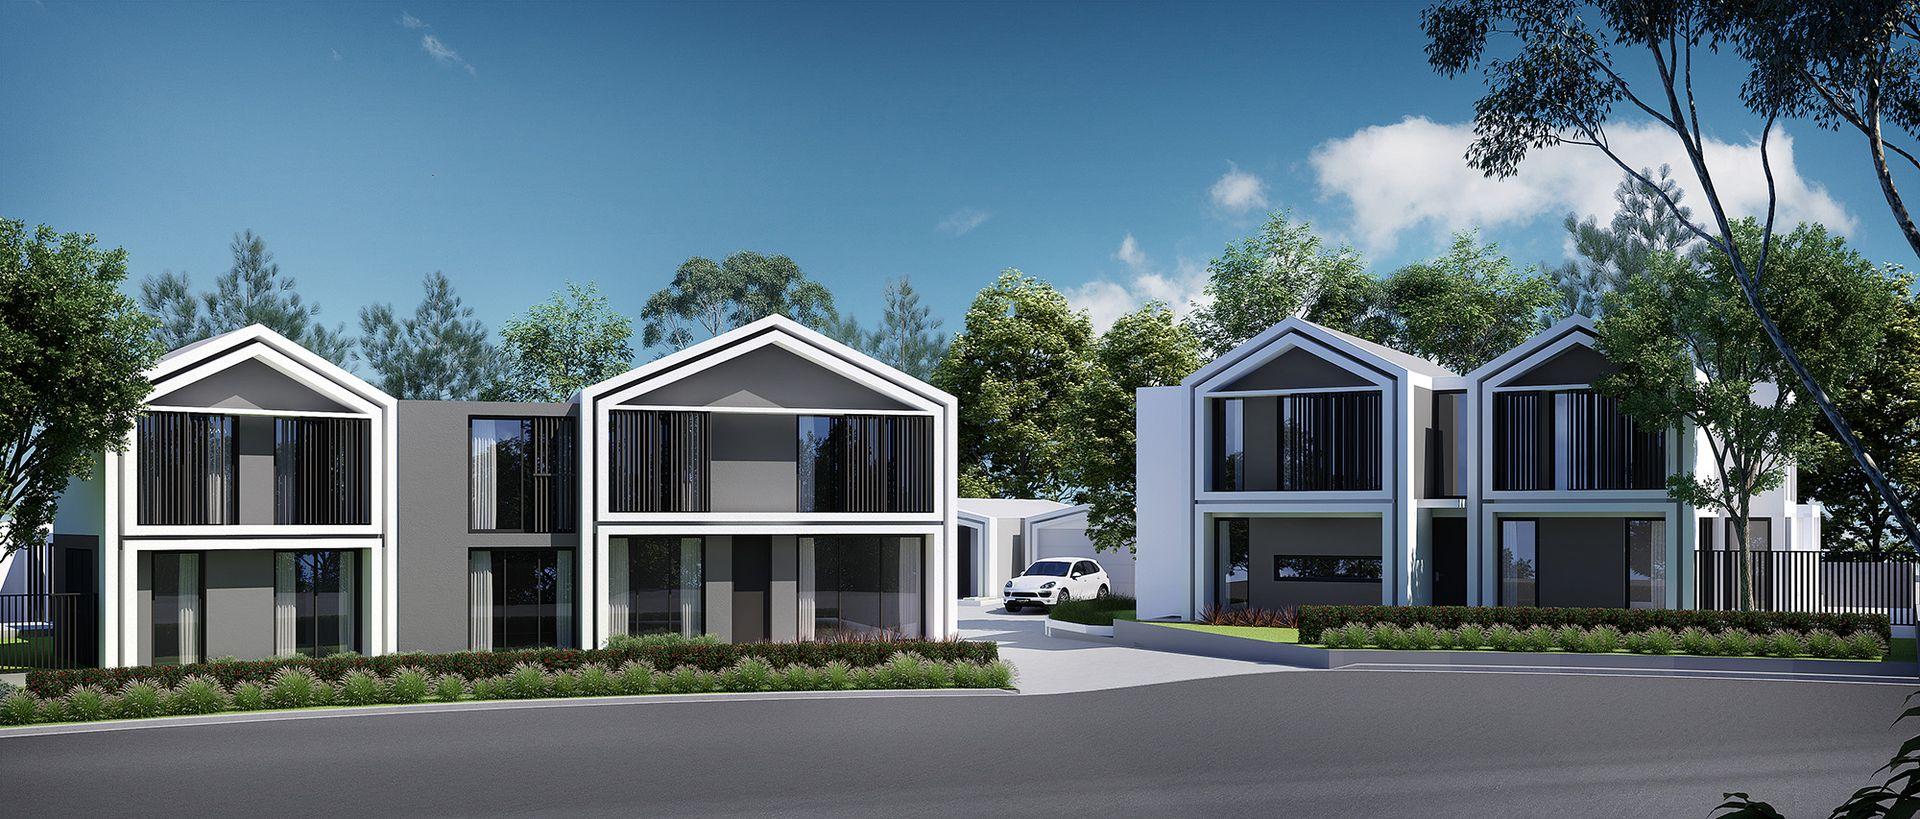 47-51  Irene Crescent, Eastwood, NSW 2122, Image 0